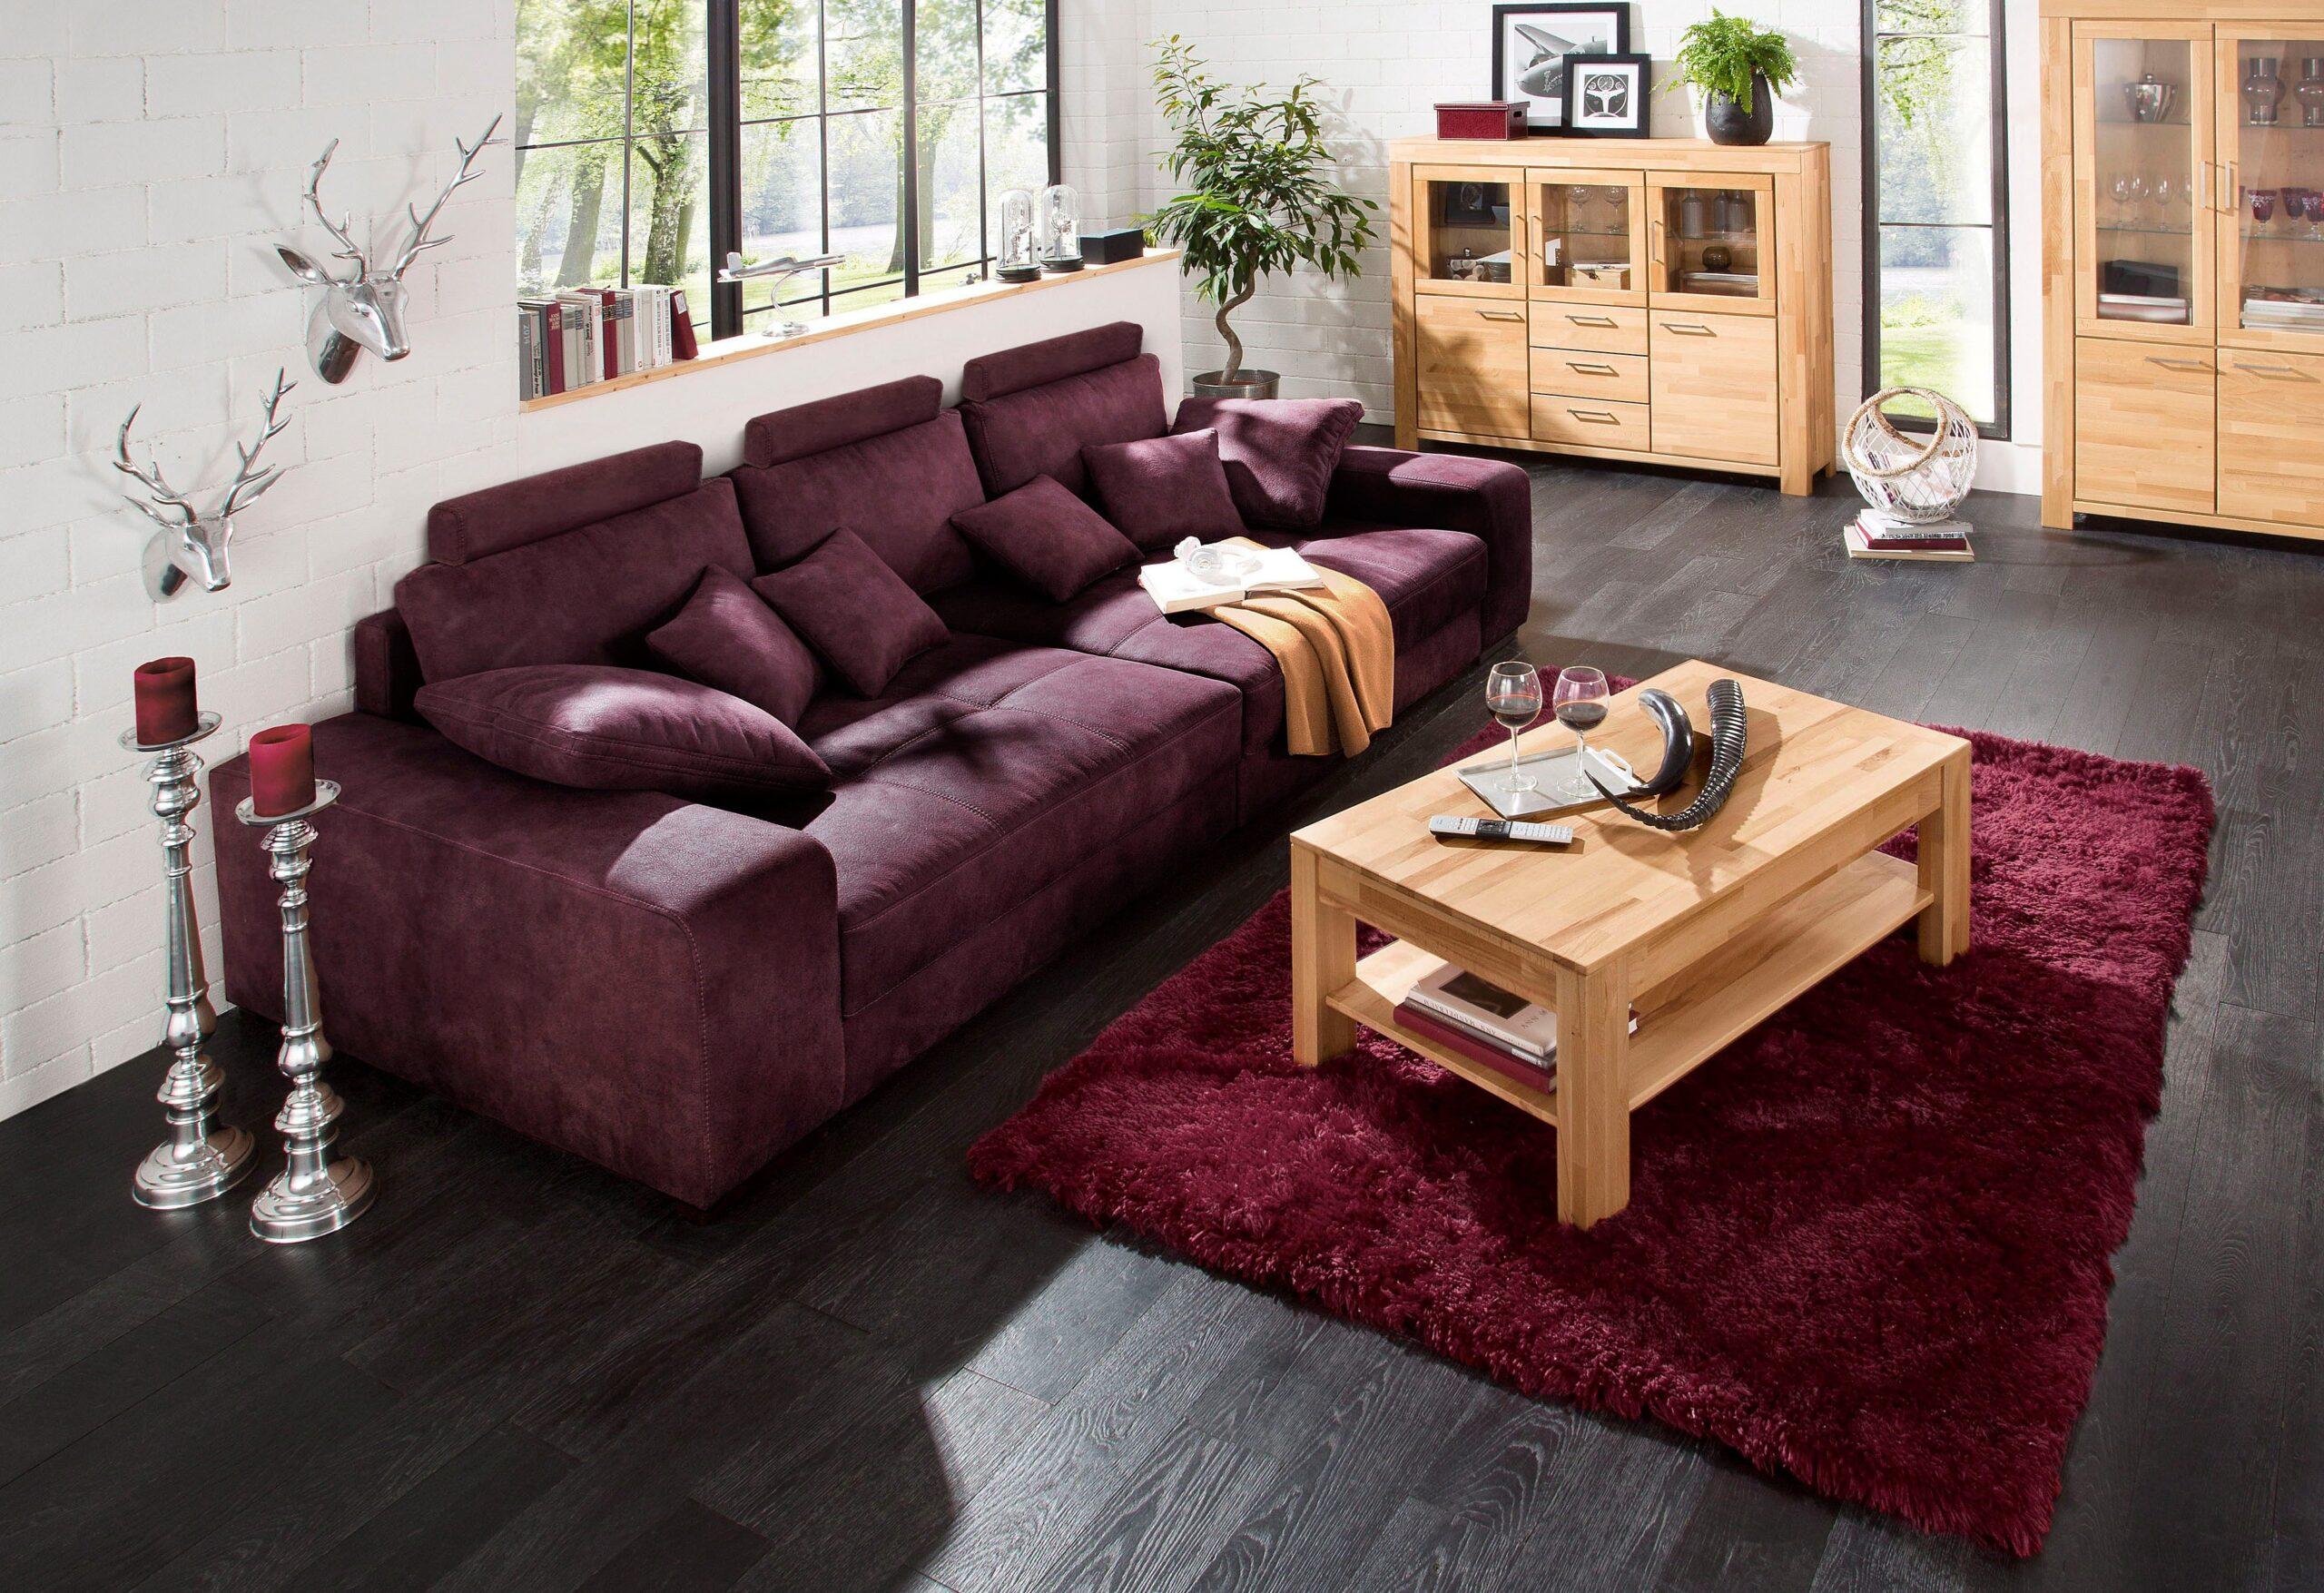 Full Size of Home Affaire Big Sofa 2 Sitzer Mit Relaxfunktion Schlaf Samt überzug Kolonialstil Abnehmbaren Bezug Brühl Modulares Rund Billig Xxl Grau Blaues Konfigurator Sofa Home Affaire Big Sofa